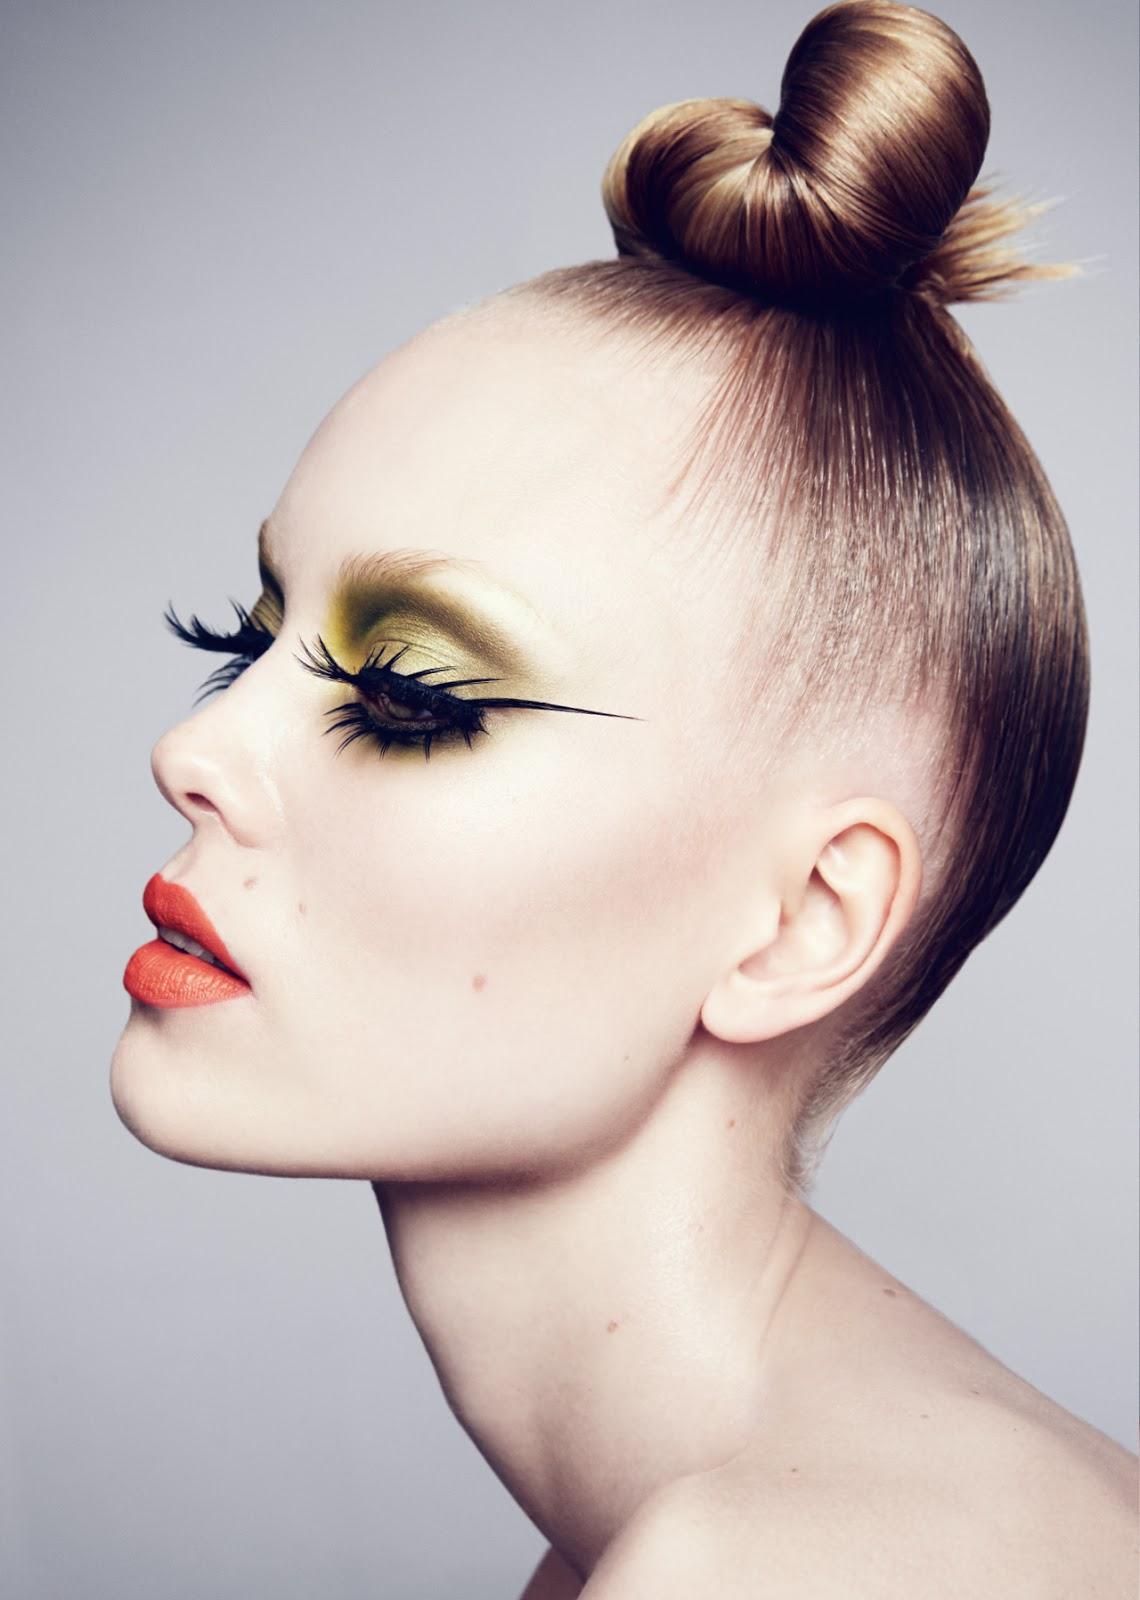 Makeup Photography: Hanna Hojman And Sofie Theobald By Benjamin Vnuk For NK